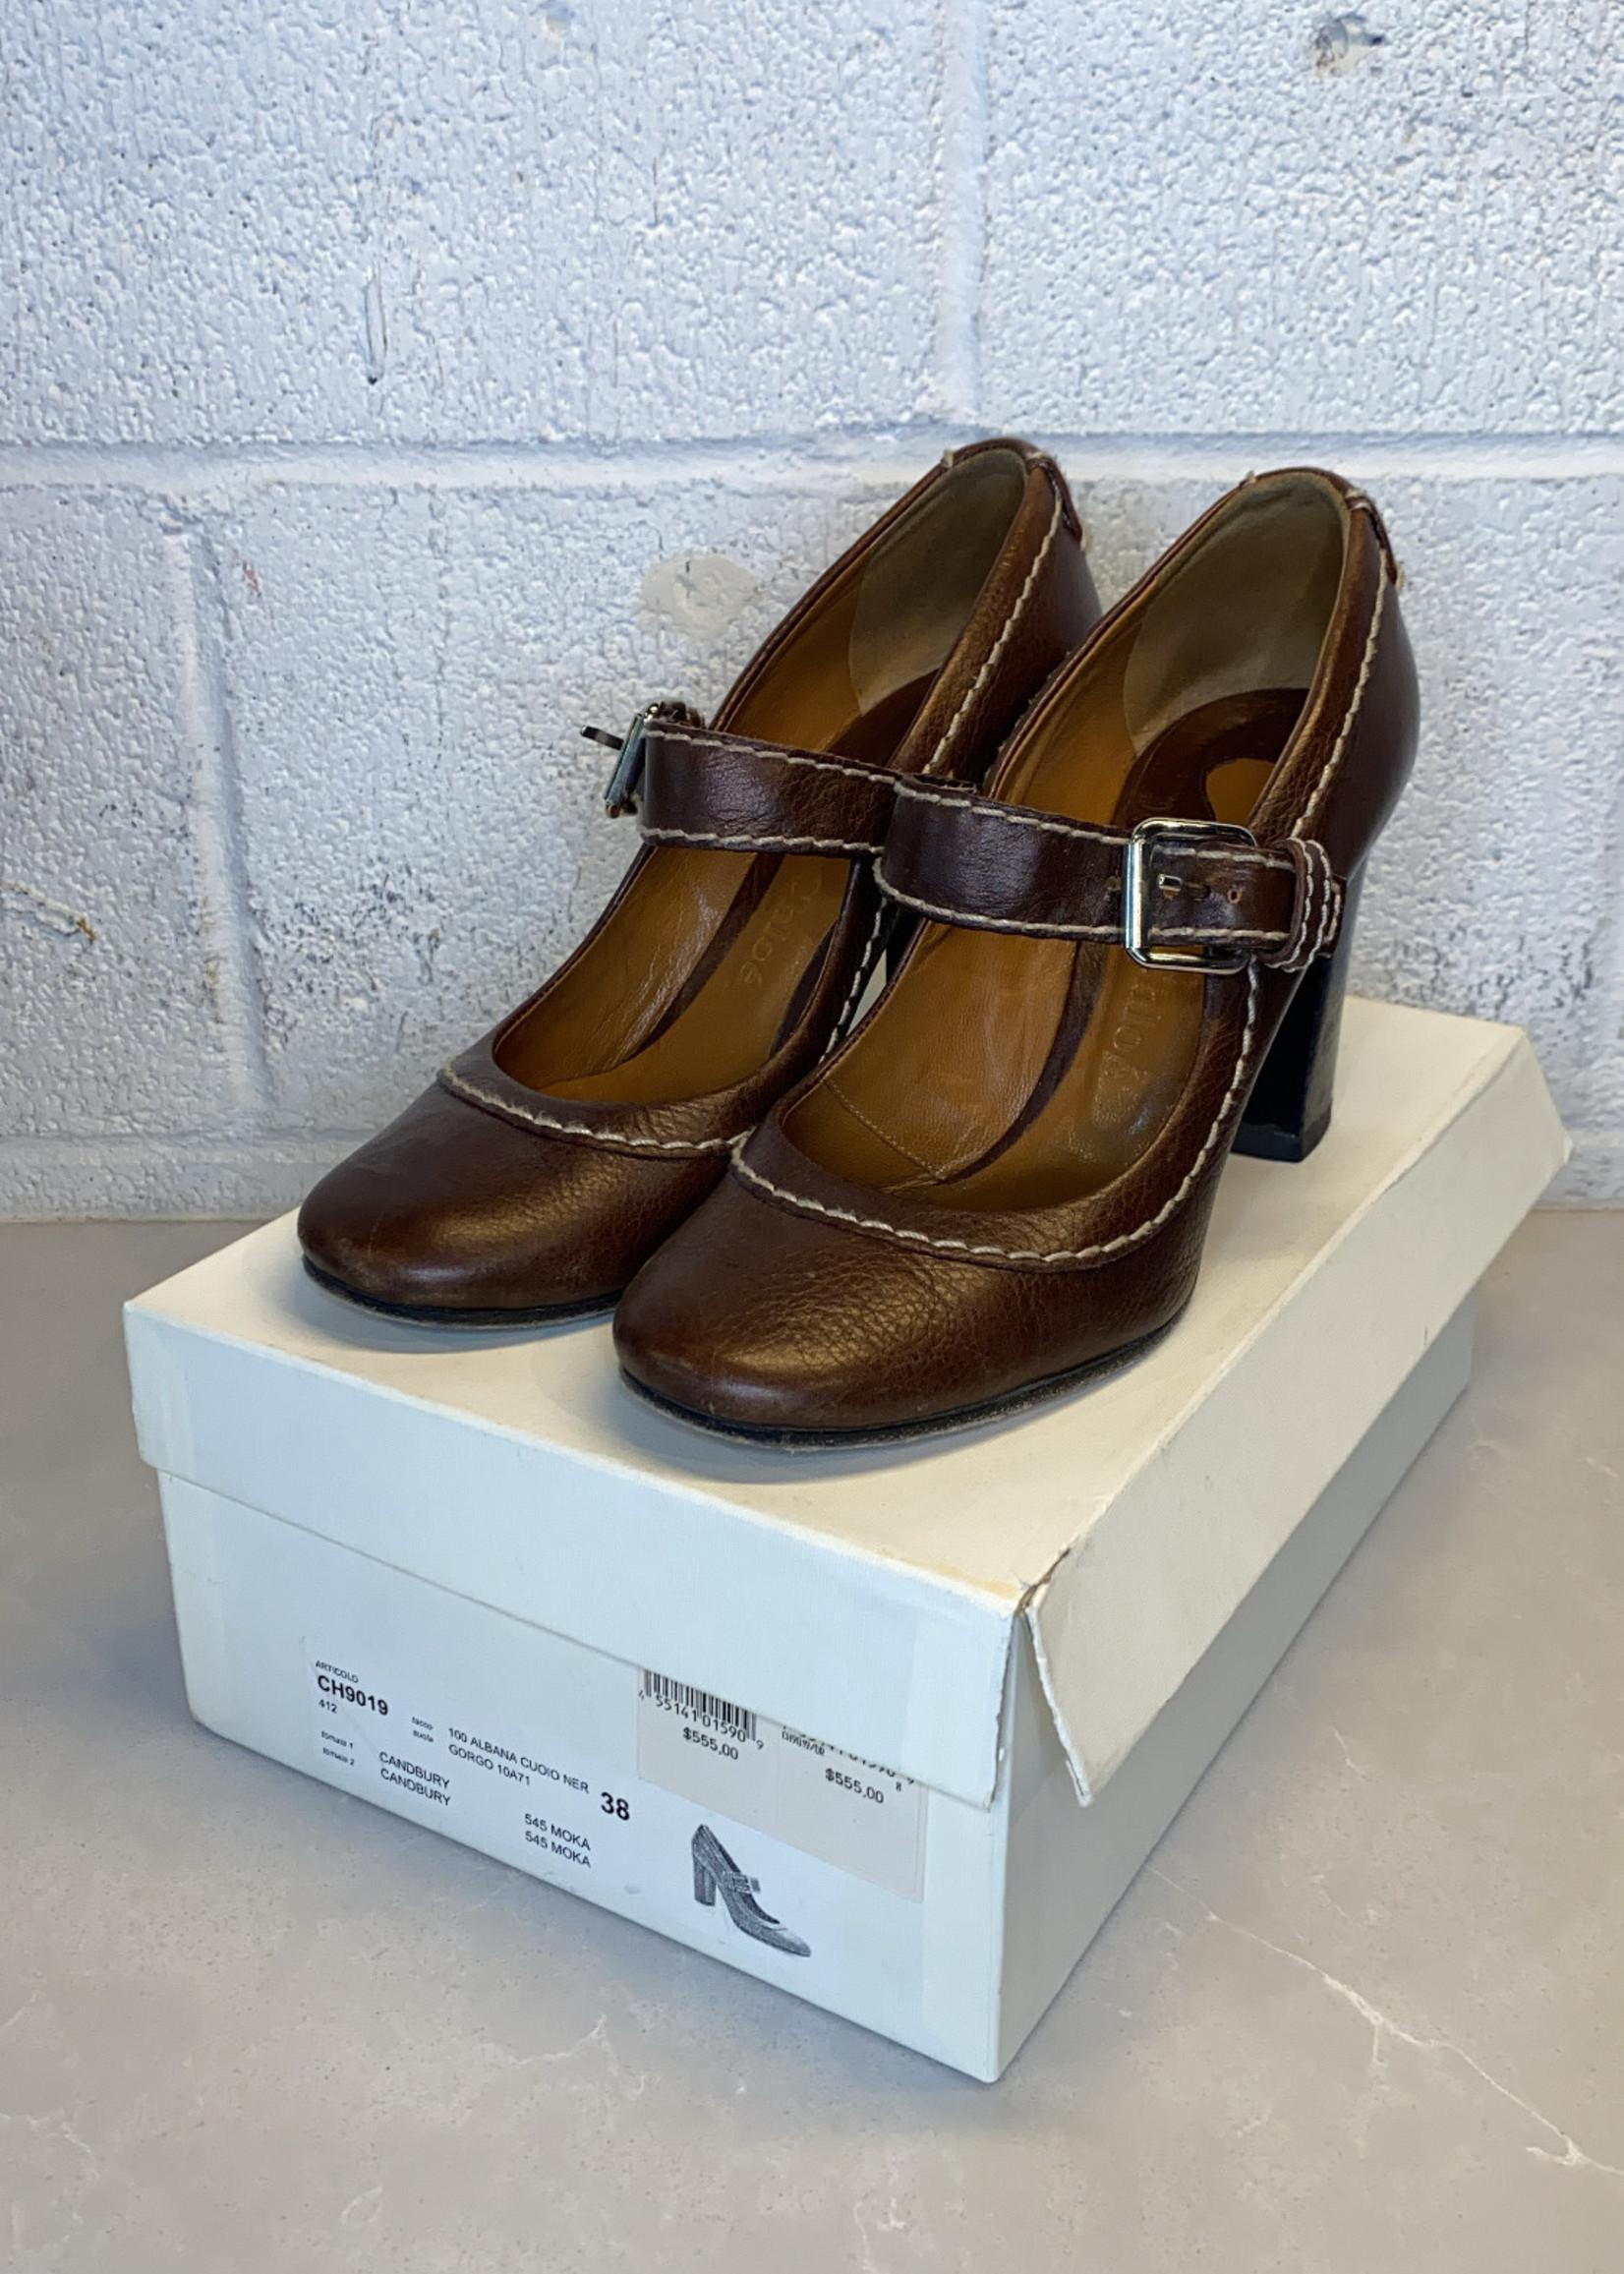 Chloe Candbury Brown Leather Heels (Retail: $555) 38